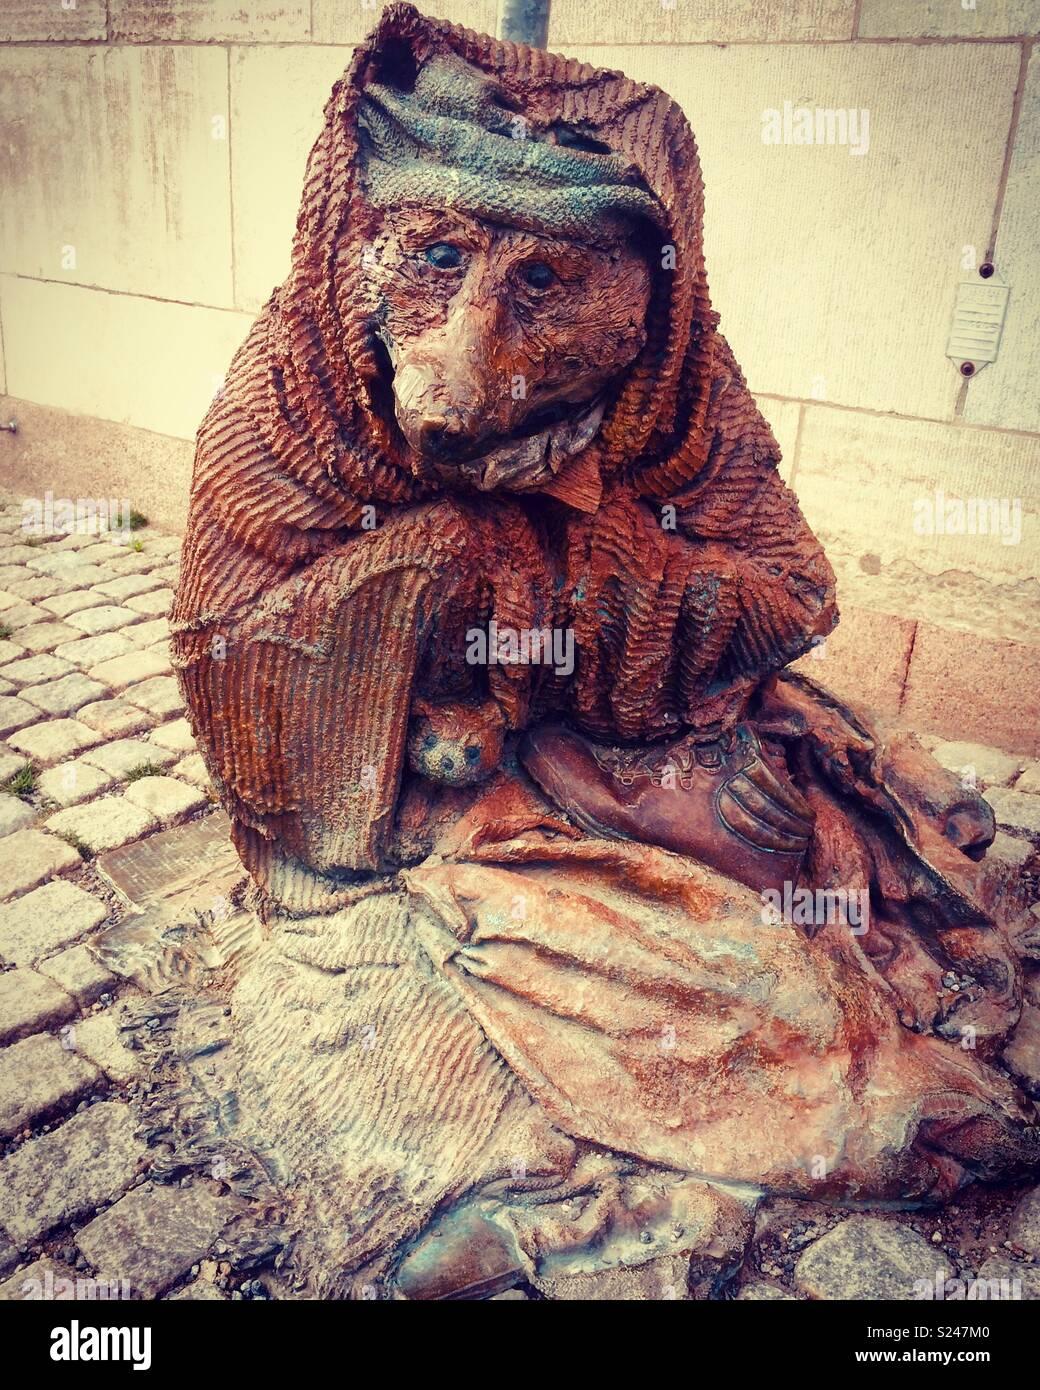 Stockholm rag and bones statue, representing homelessness - Stock Image